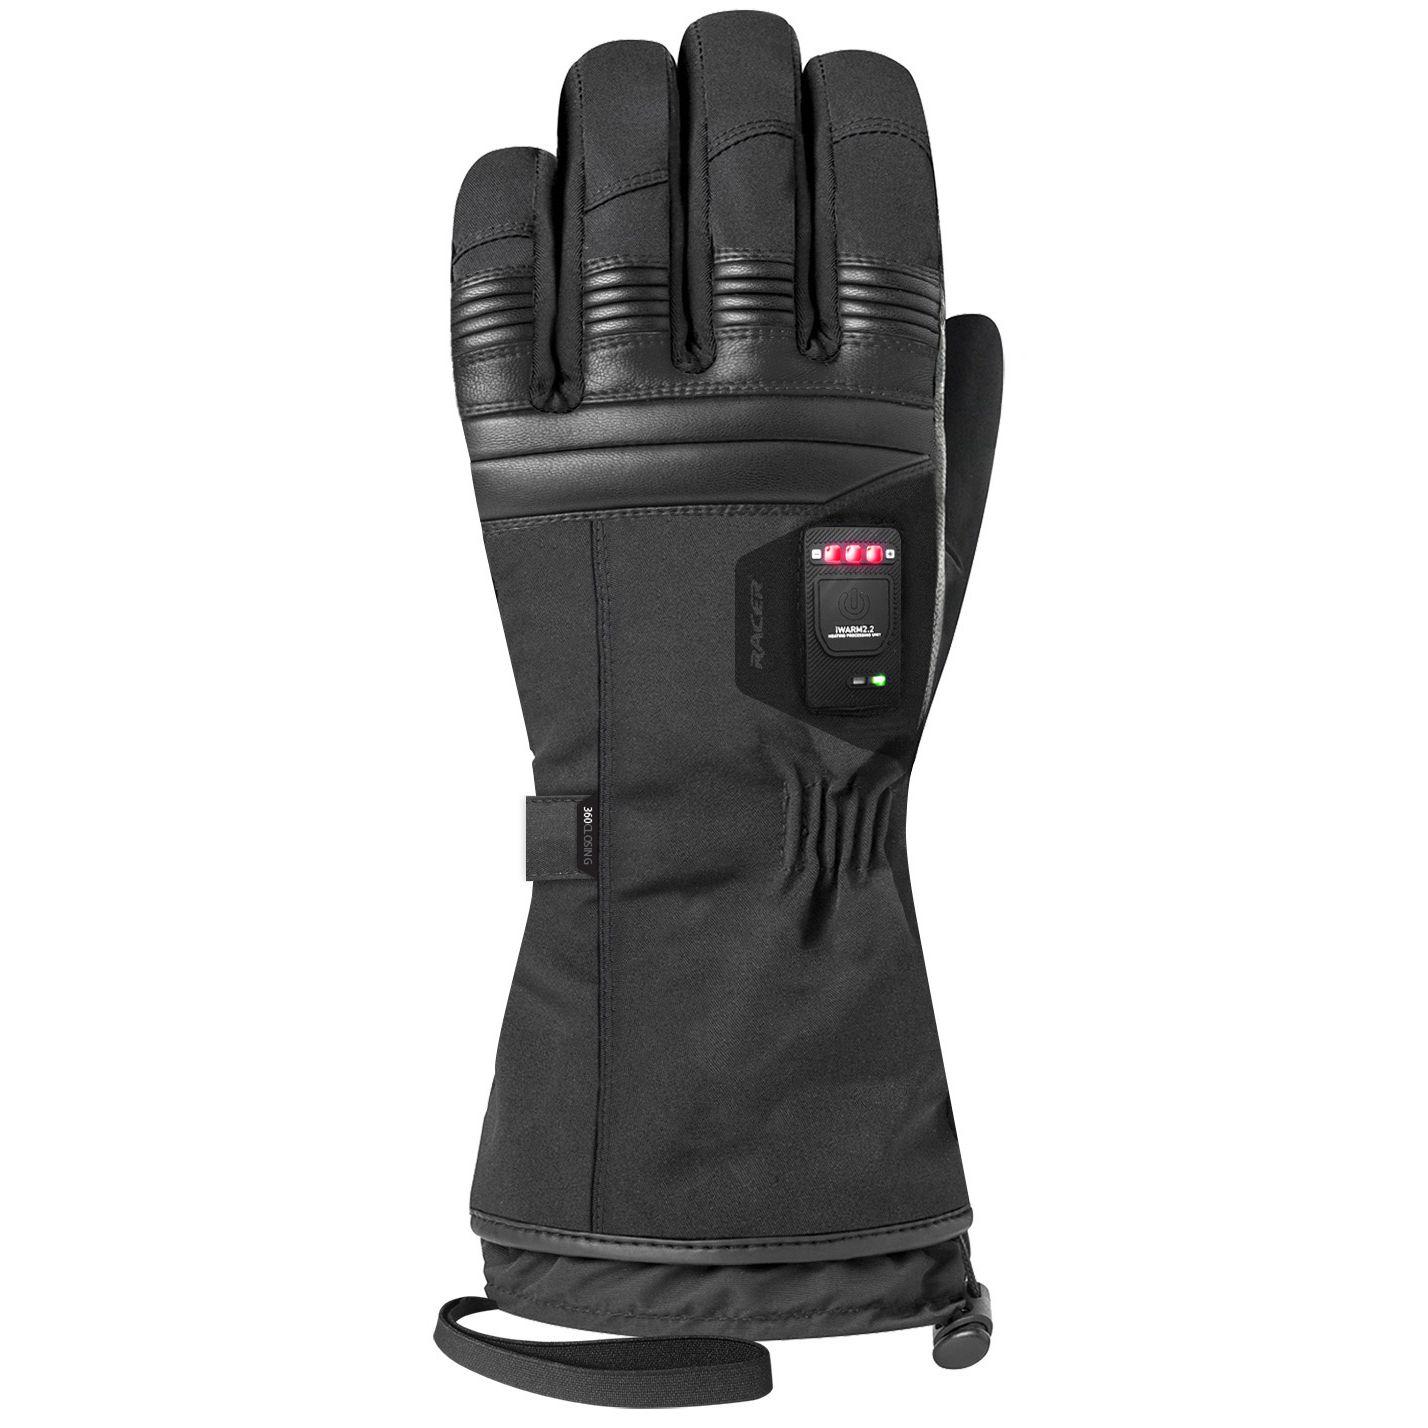 gants chauffants racer connectic 4